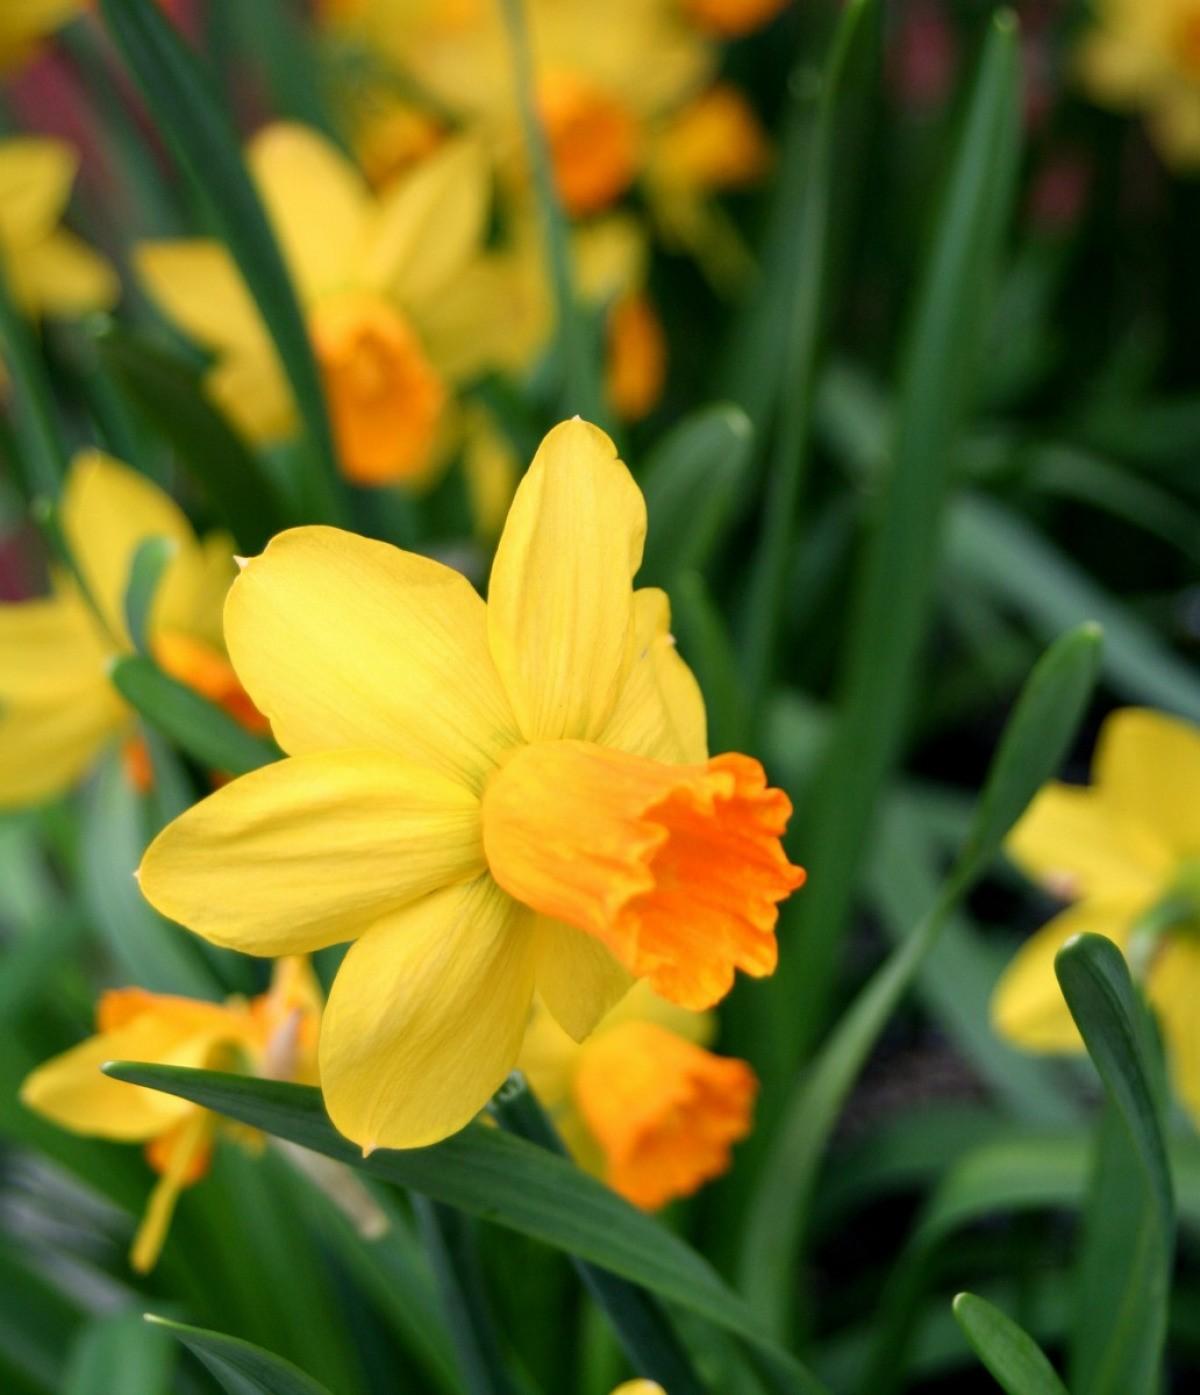 daffodil - photo #23